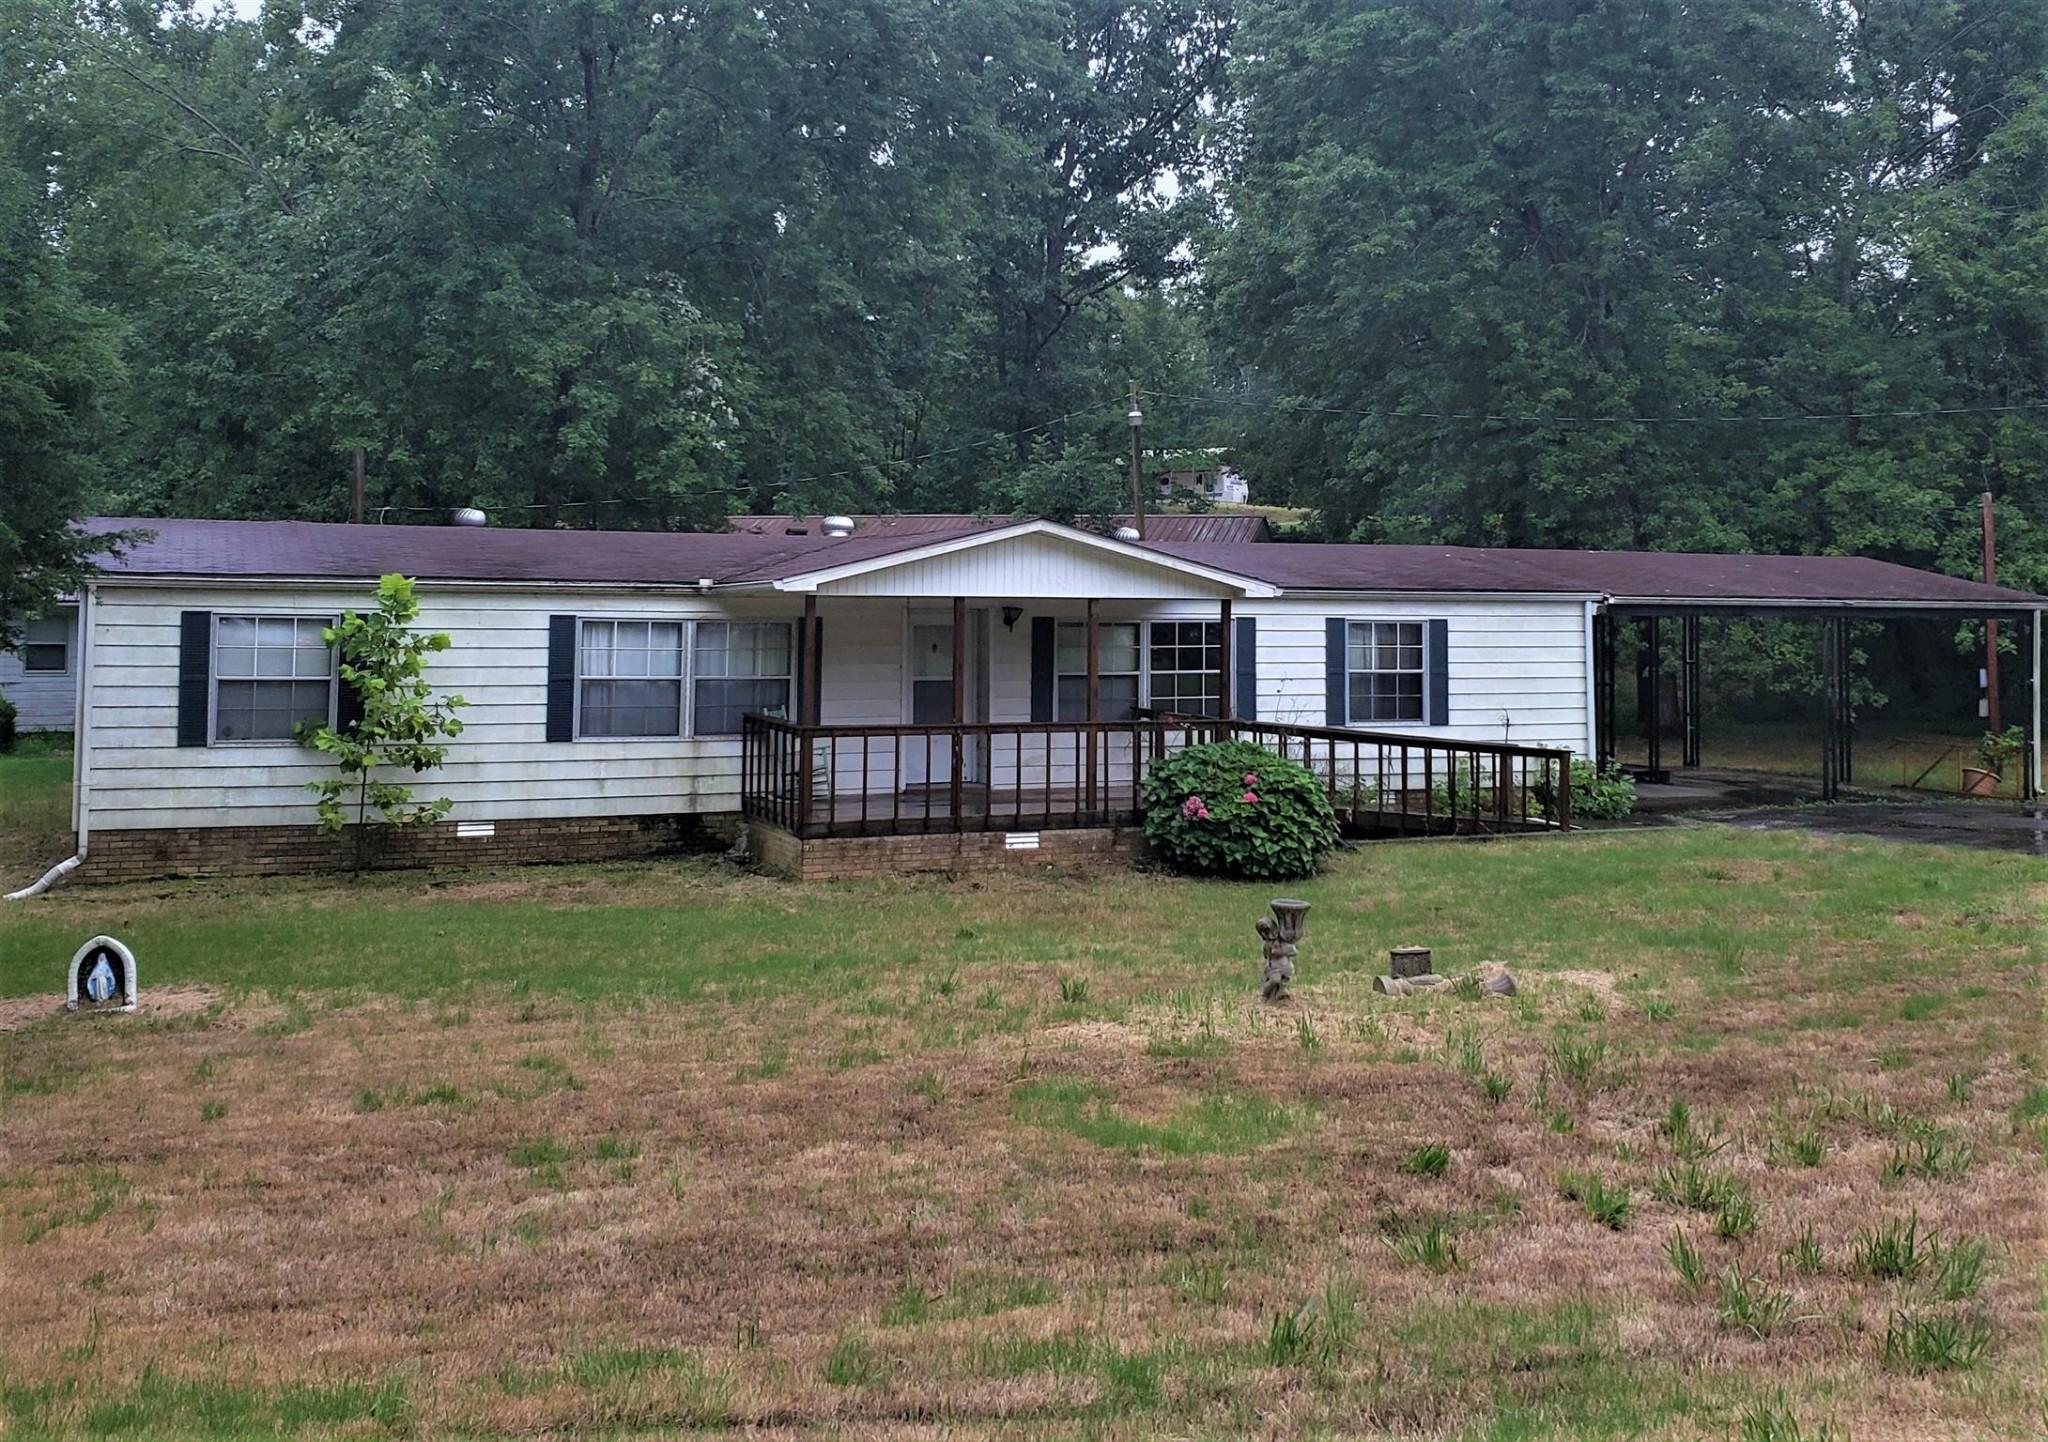 85 Upchurch Dr, Buchanan, TN 38222 - Buchanan, TN real estate listing